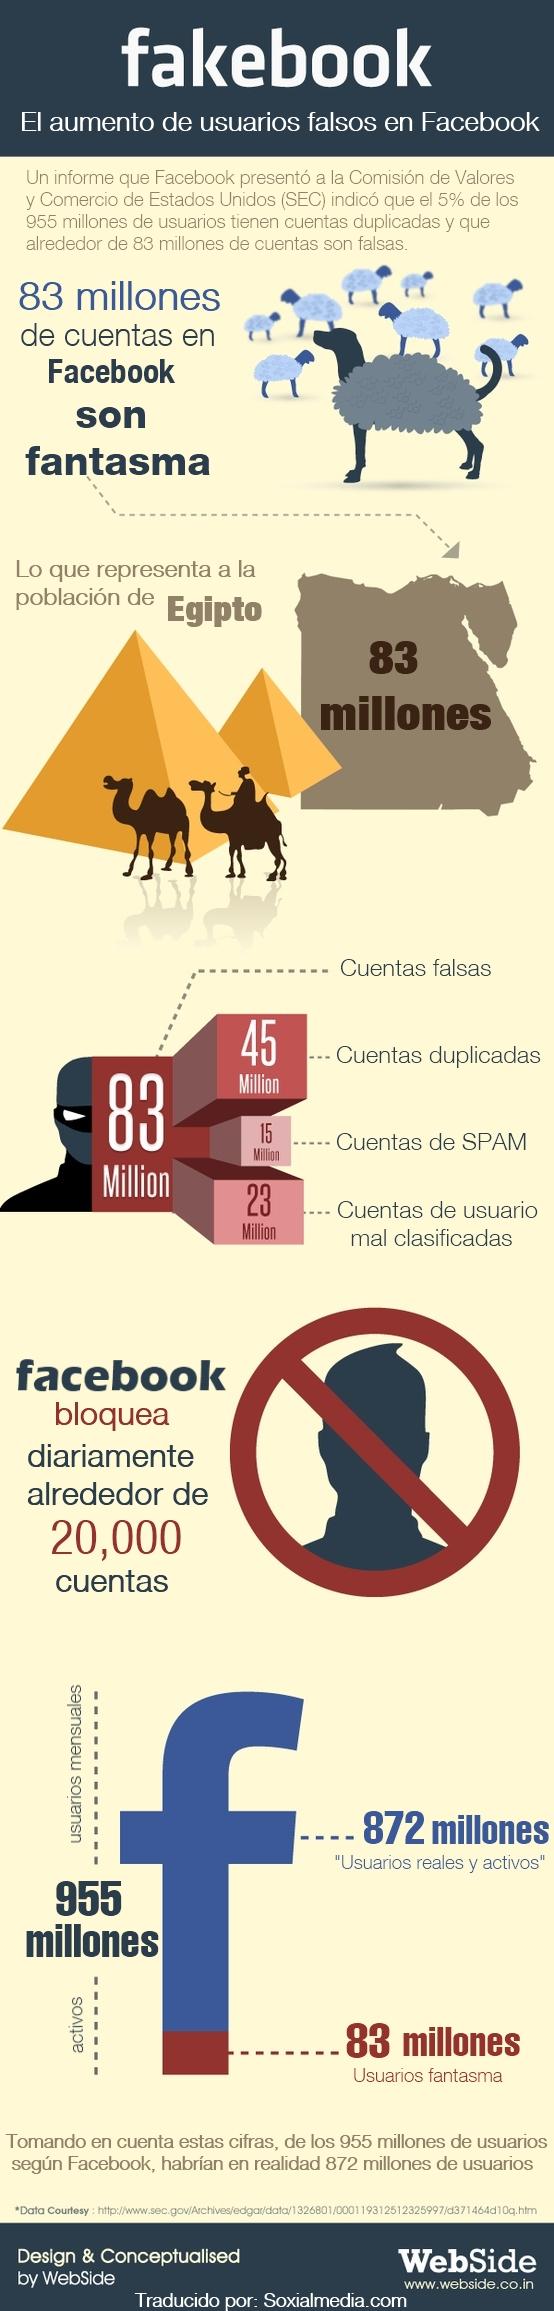 facebook usuarios falsos perfiles infografia estadistica